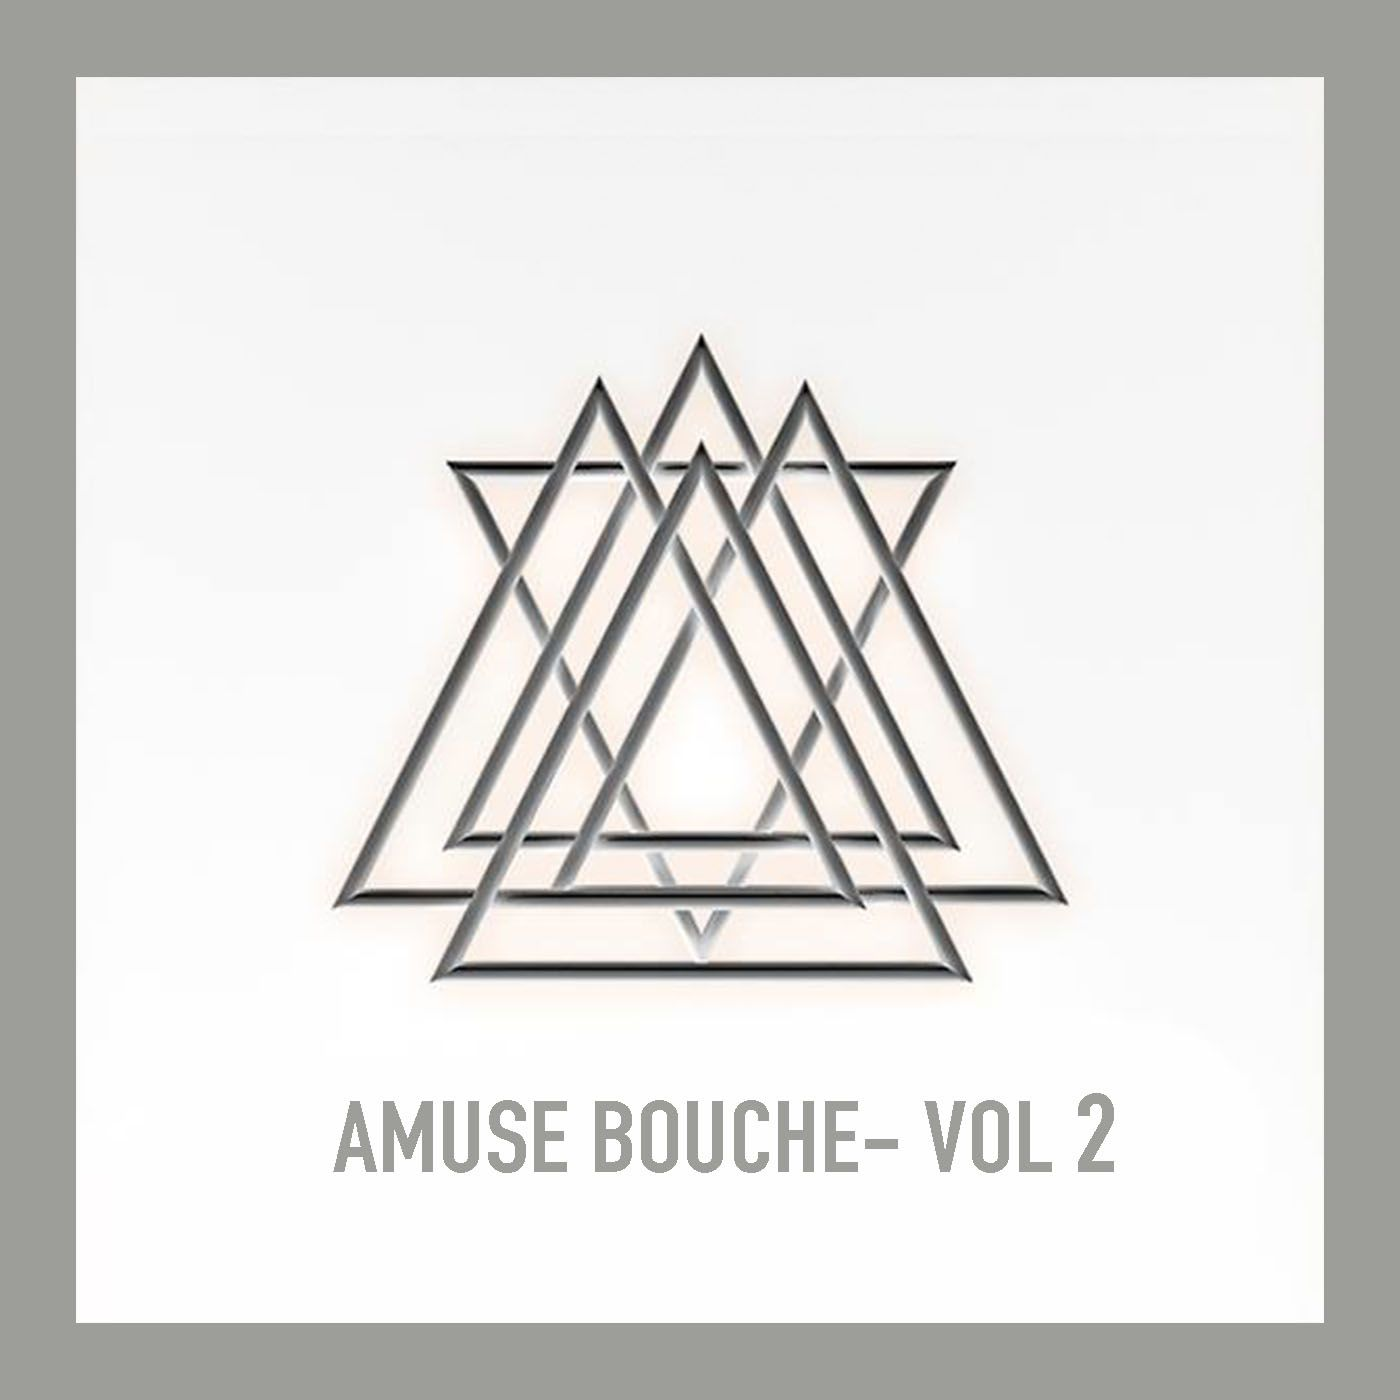 amuse_bouche_vol2_v2.jpg